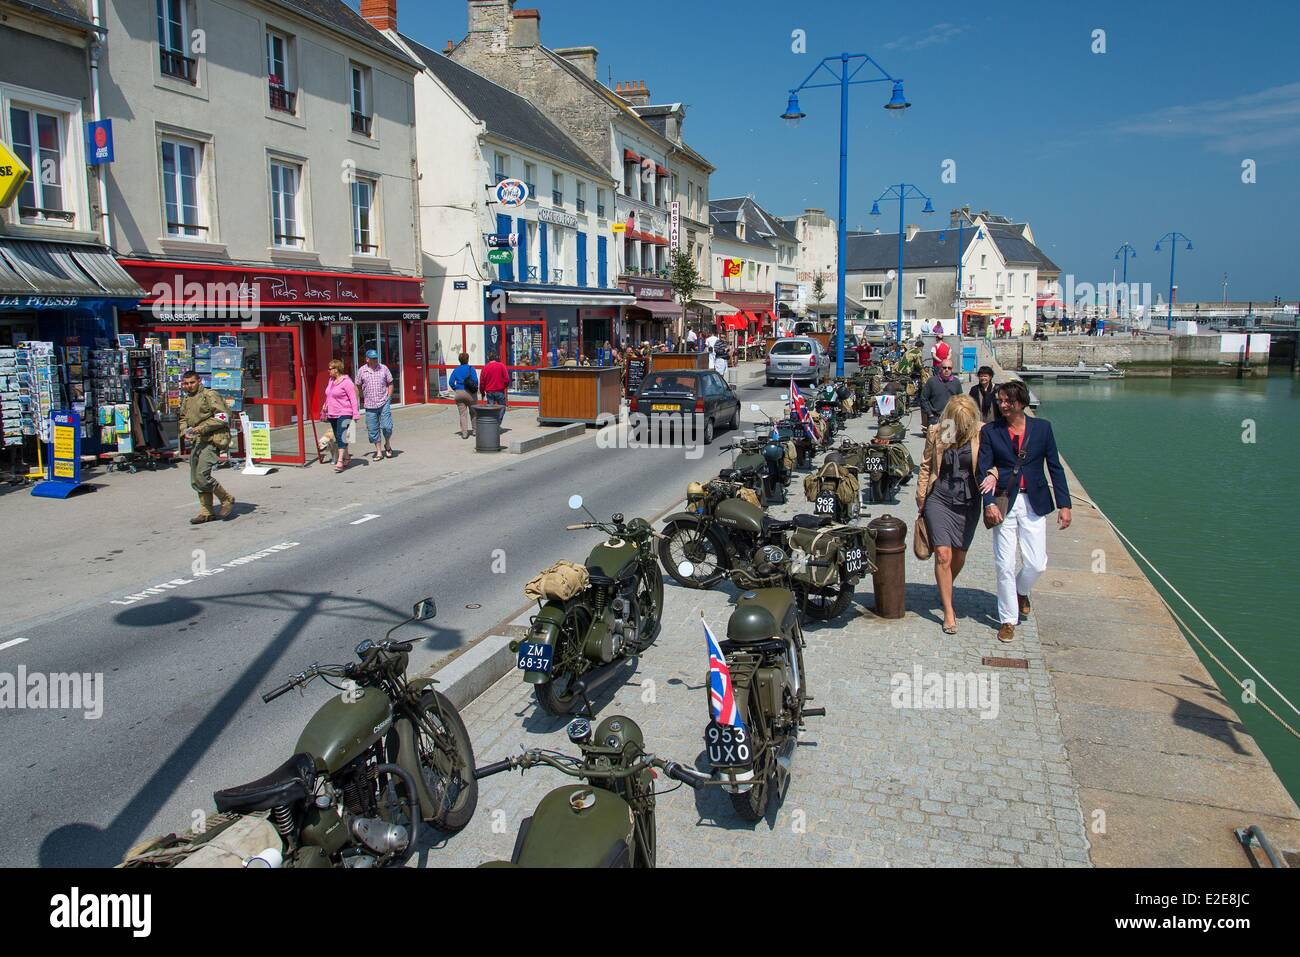 France calvados port en bessin commemoration of the june 6 1944 stock photo 70384900 alamy - Poissonnerie port en bessin ...